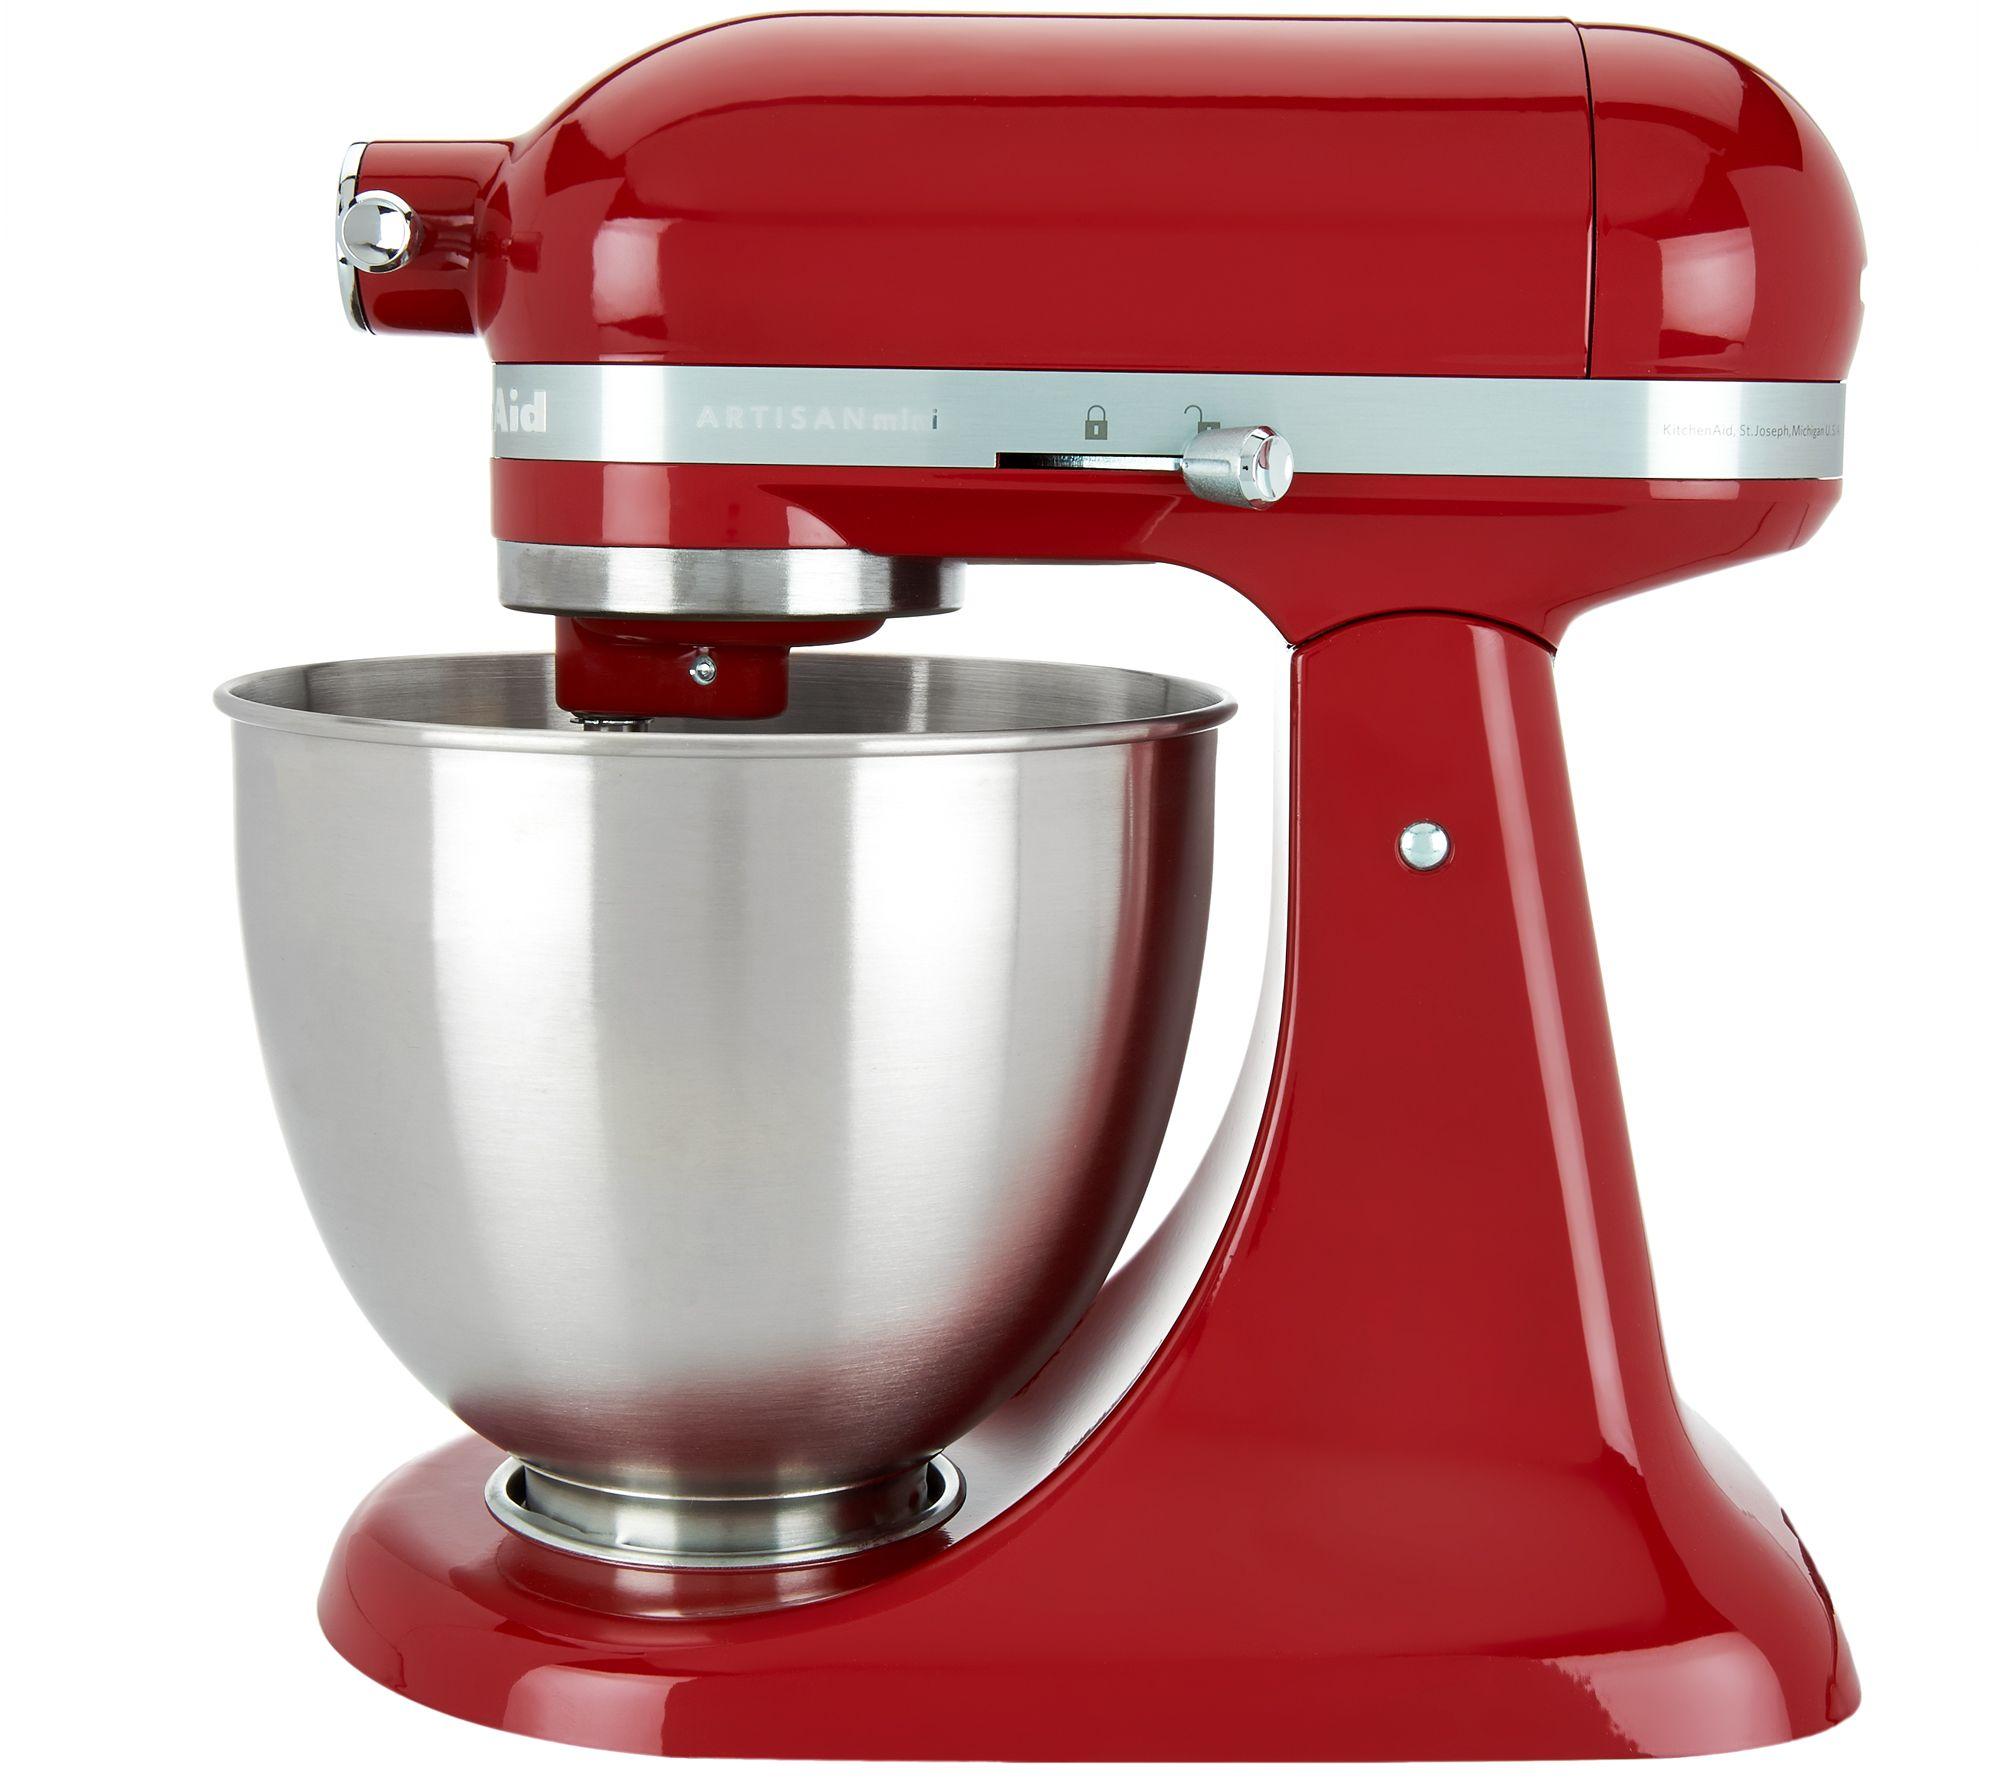 KitchenAid 3.5qt. Artisan Stand Mixer With Flex Edge Beater   Page 1 U2014  QVC.com